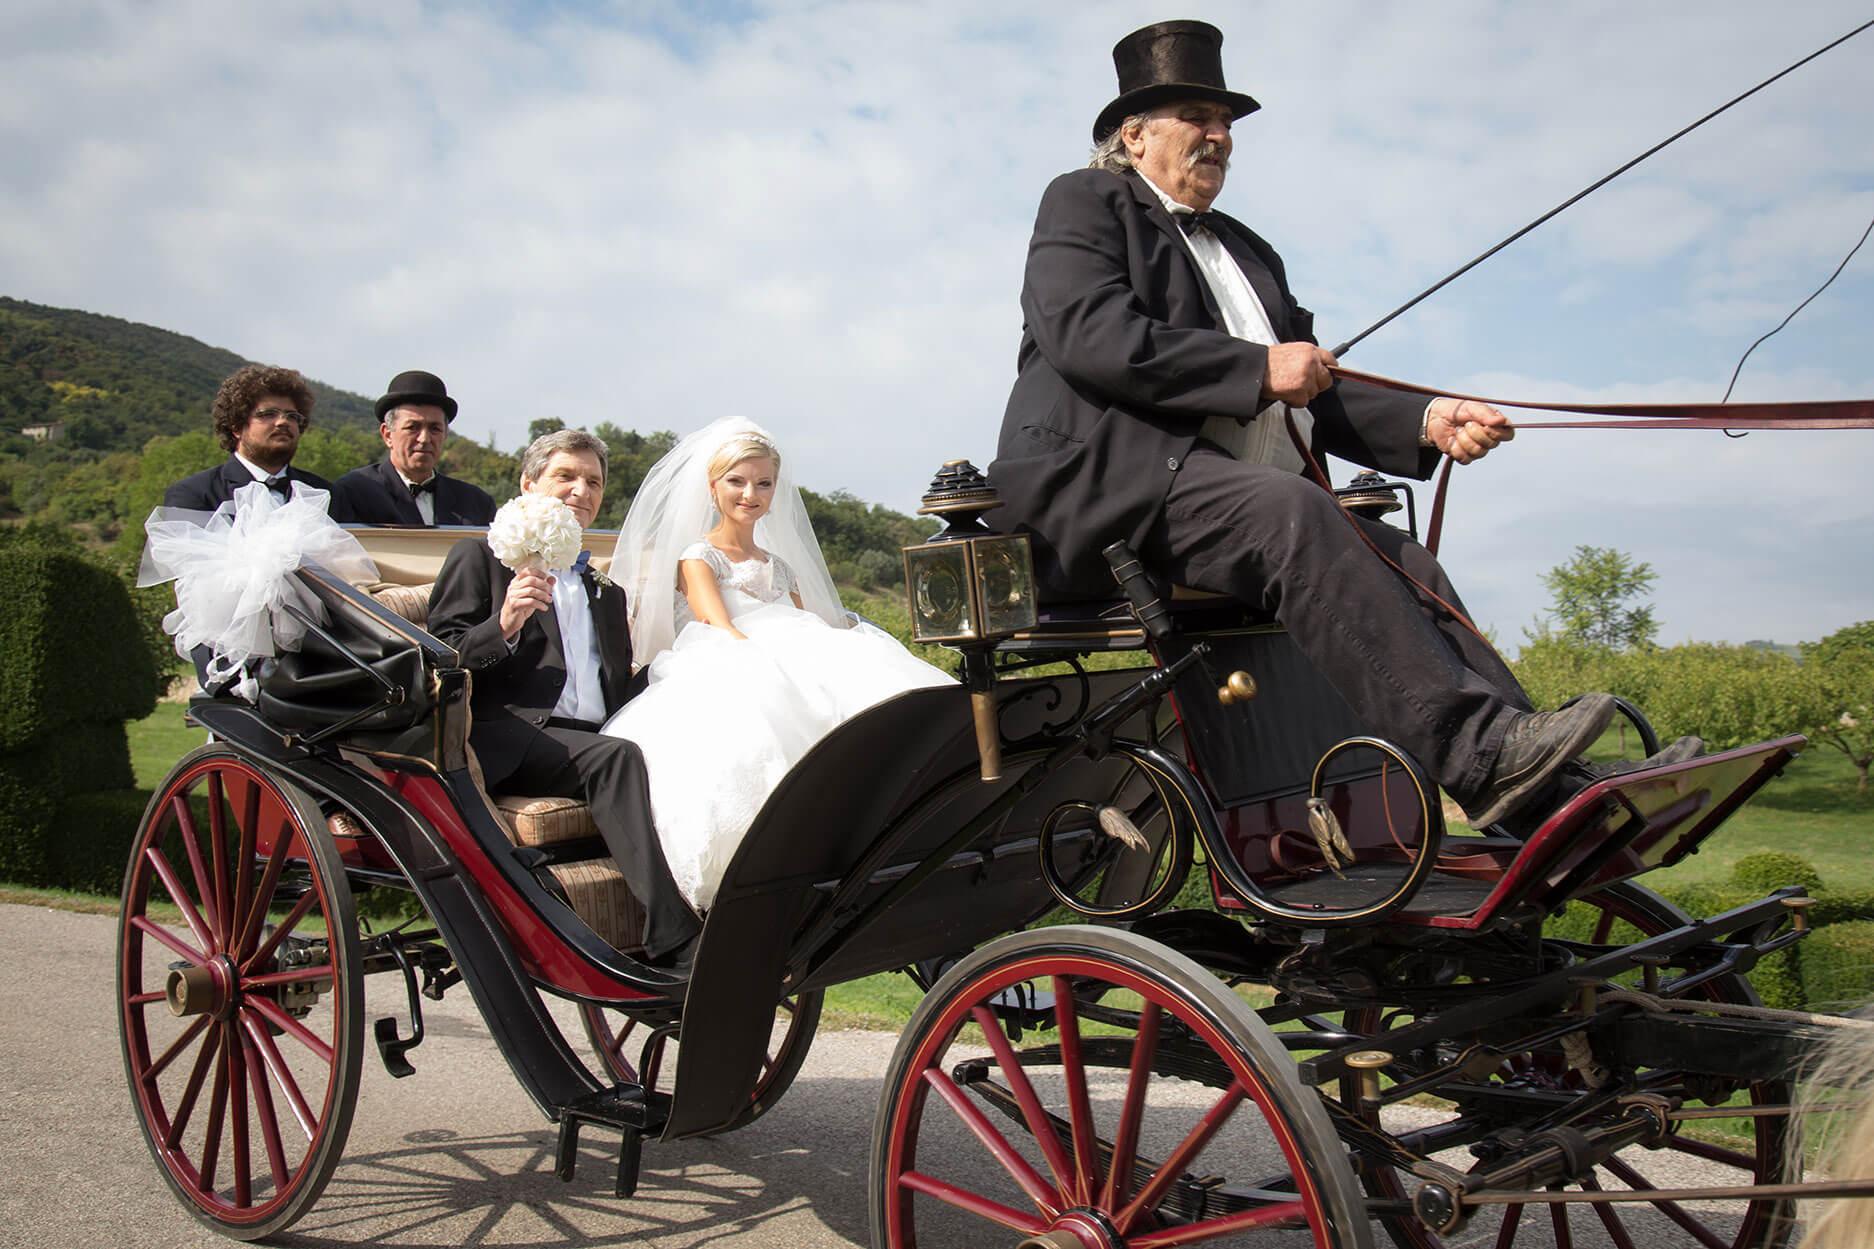 Francesca-Ferrati-wedding-photographer-Verona-Svetlana-Gianluigi12